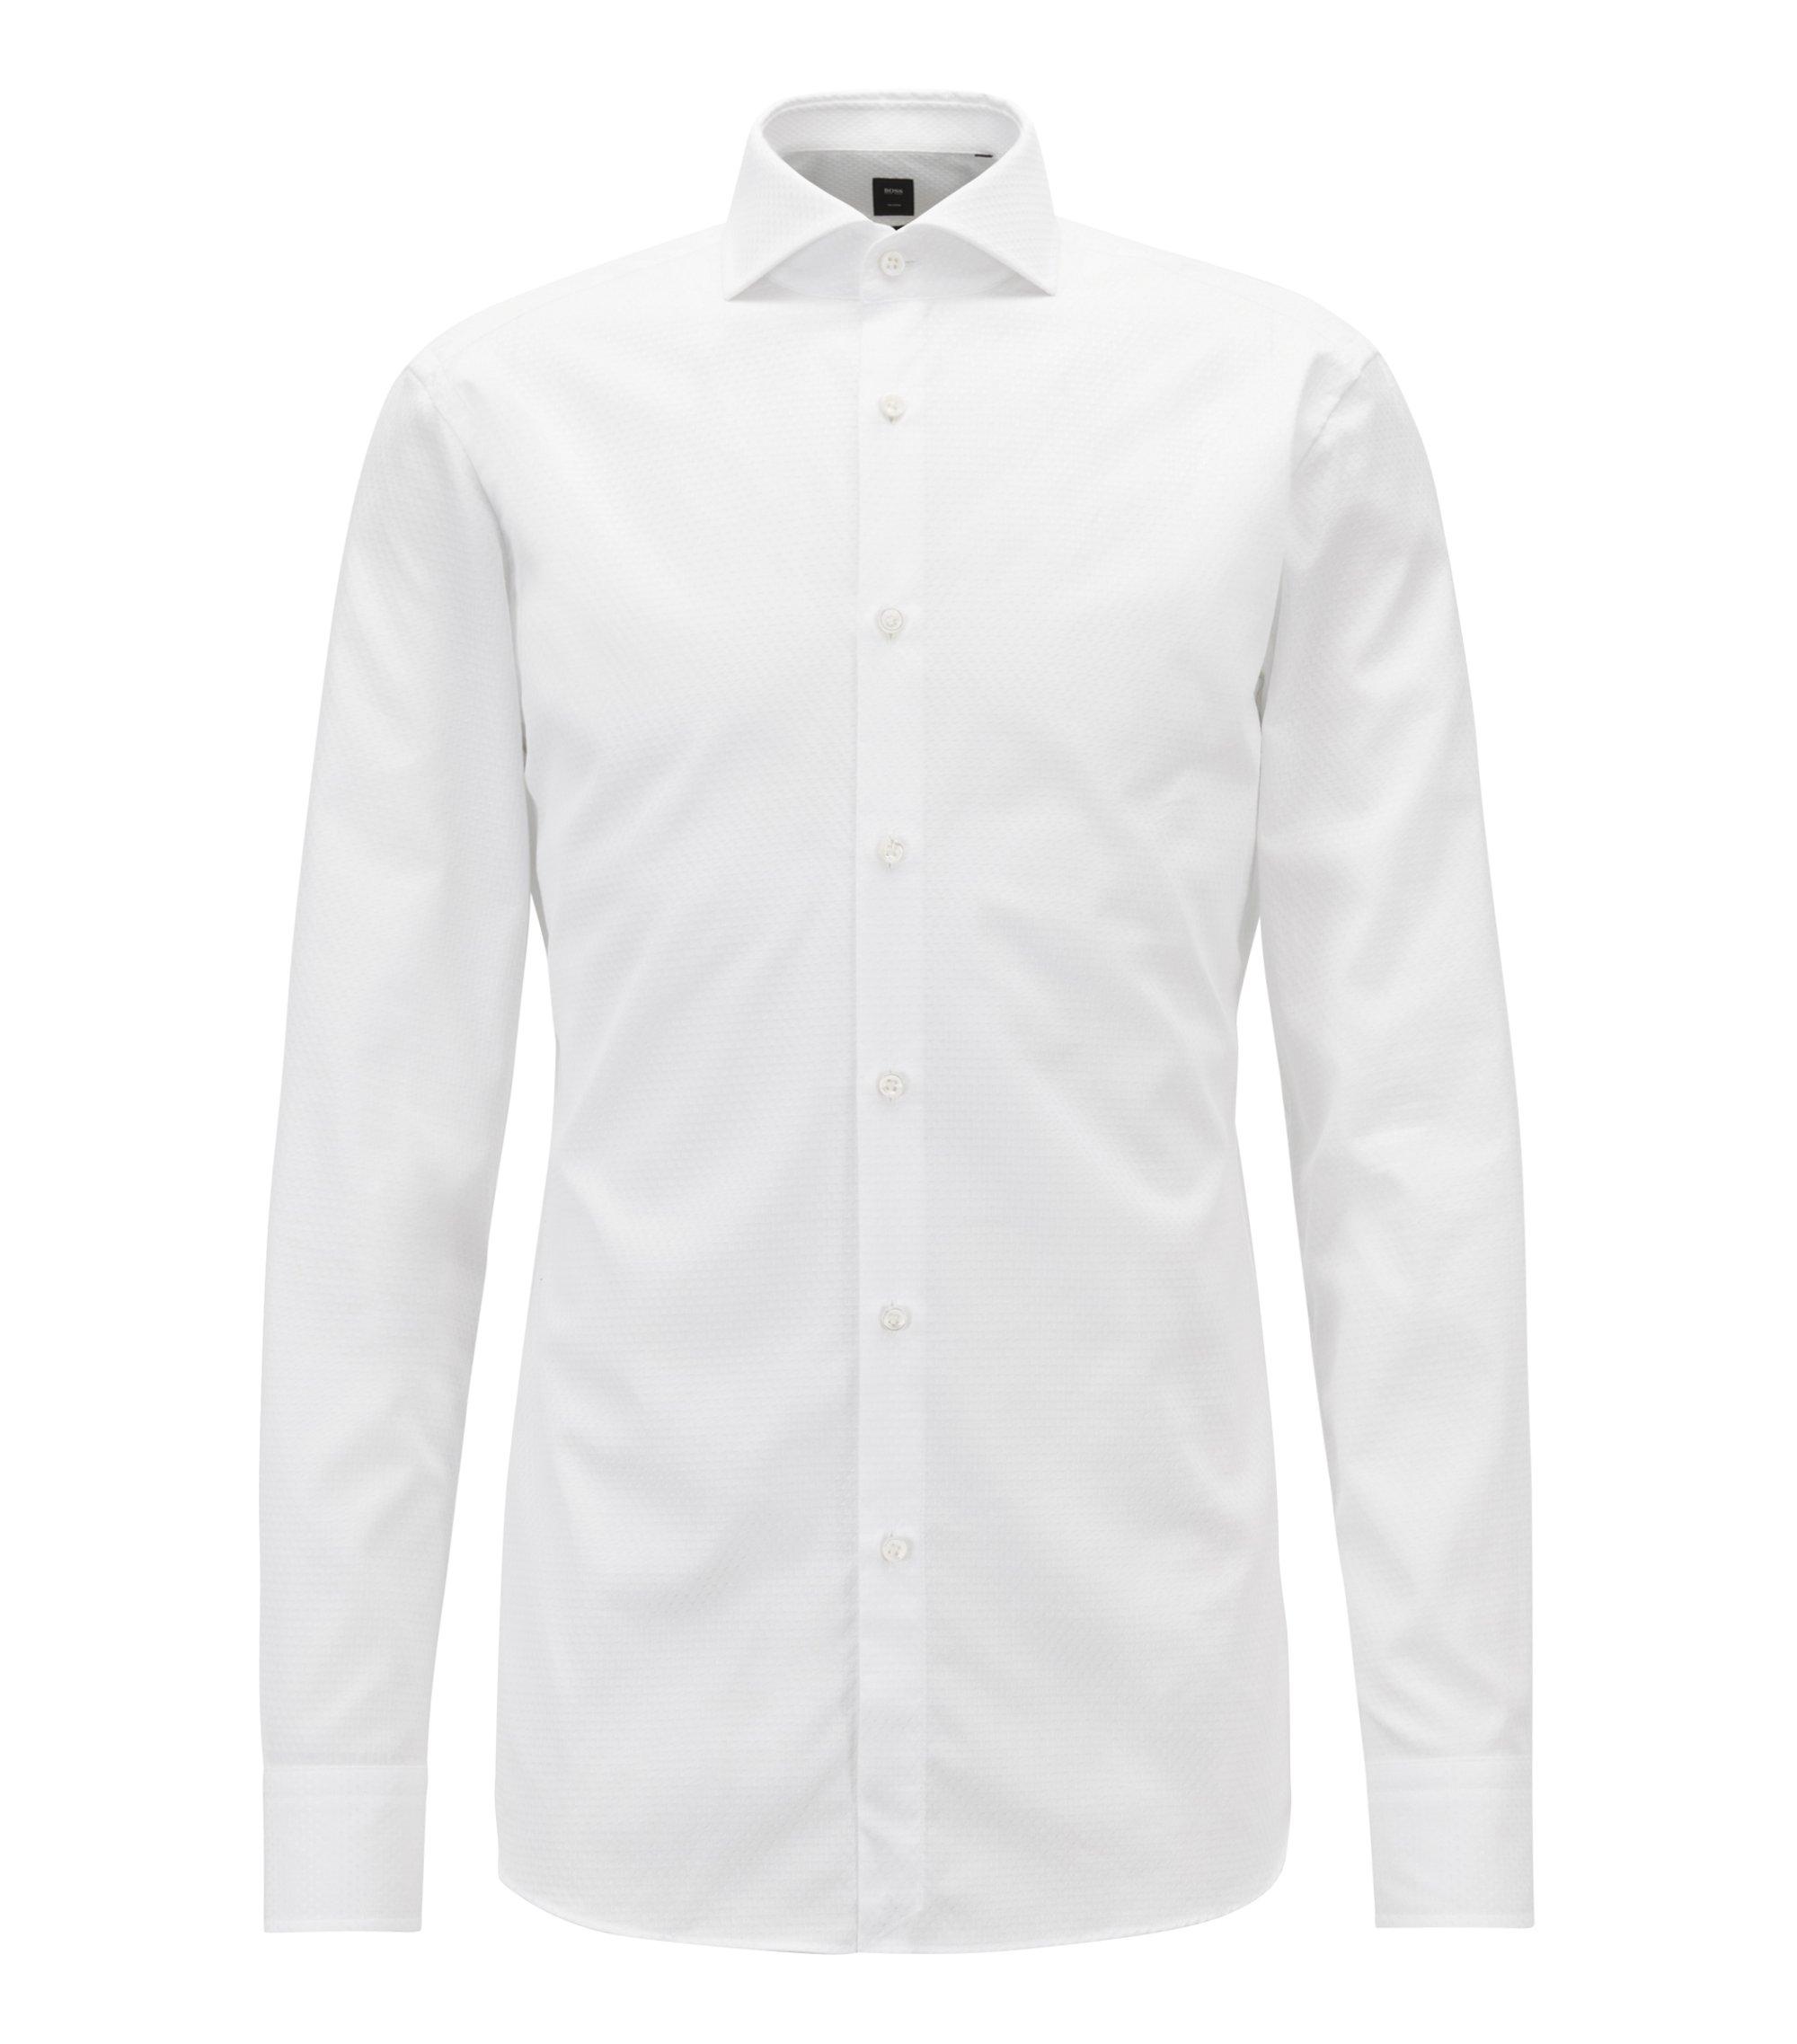 Slim-fit shirt with square motif on cotton jacquard, White